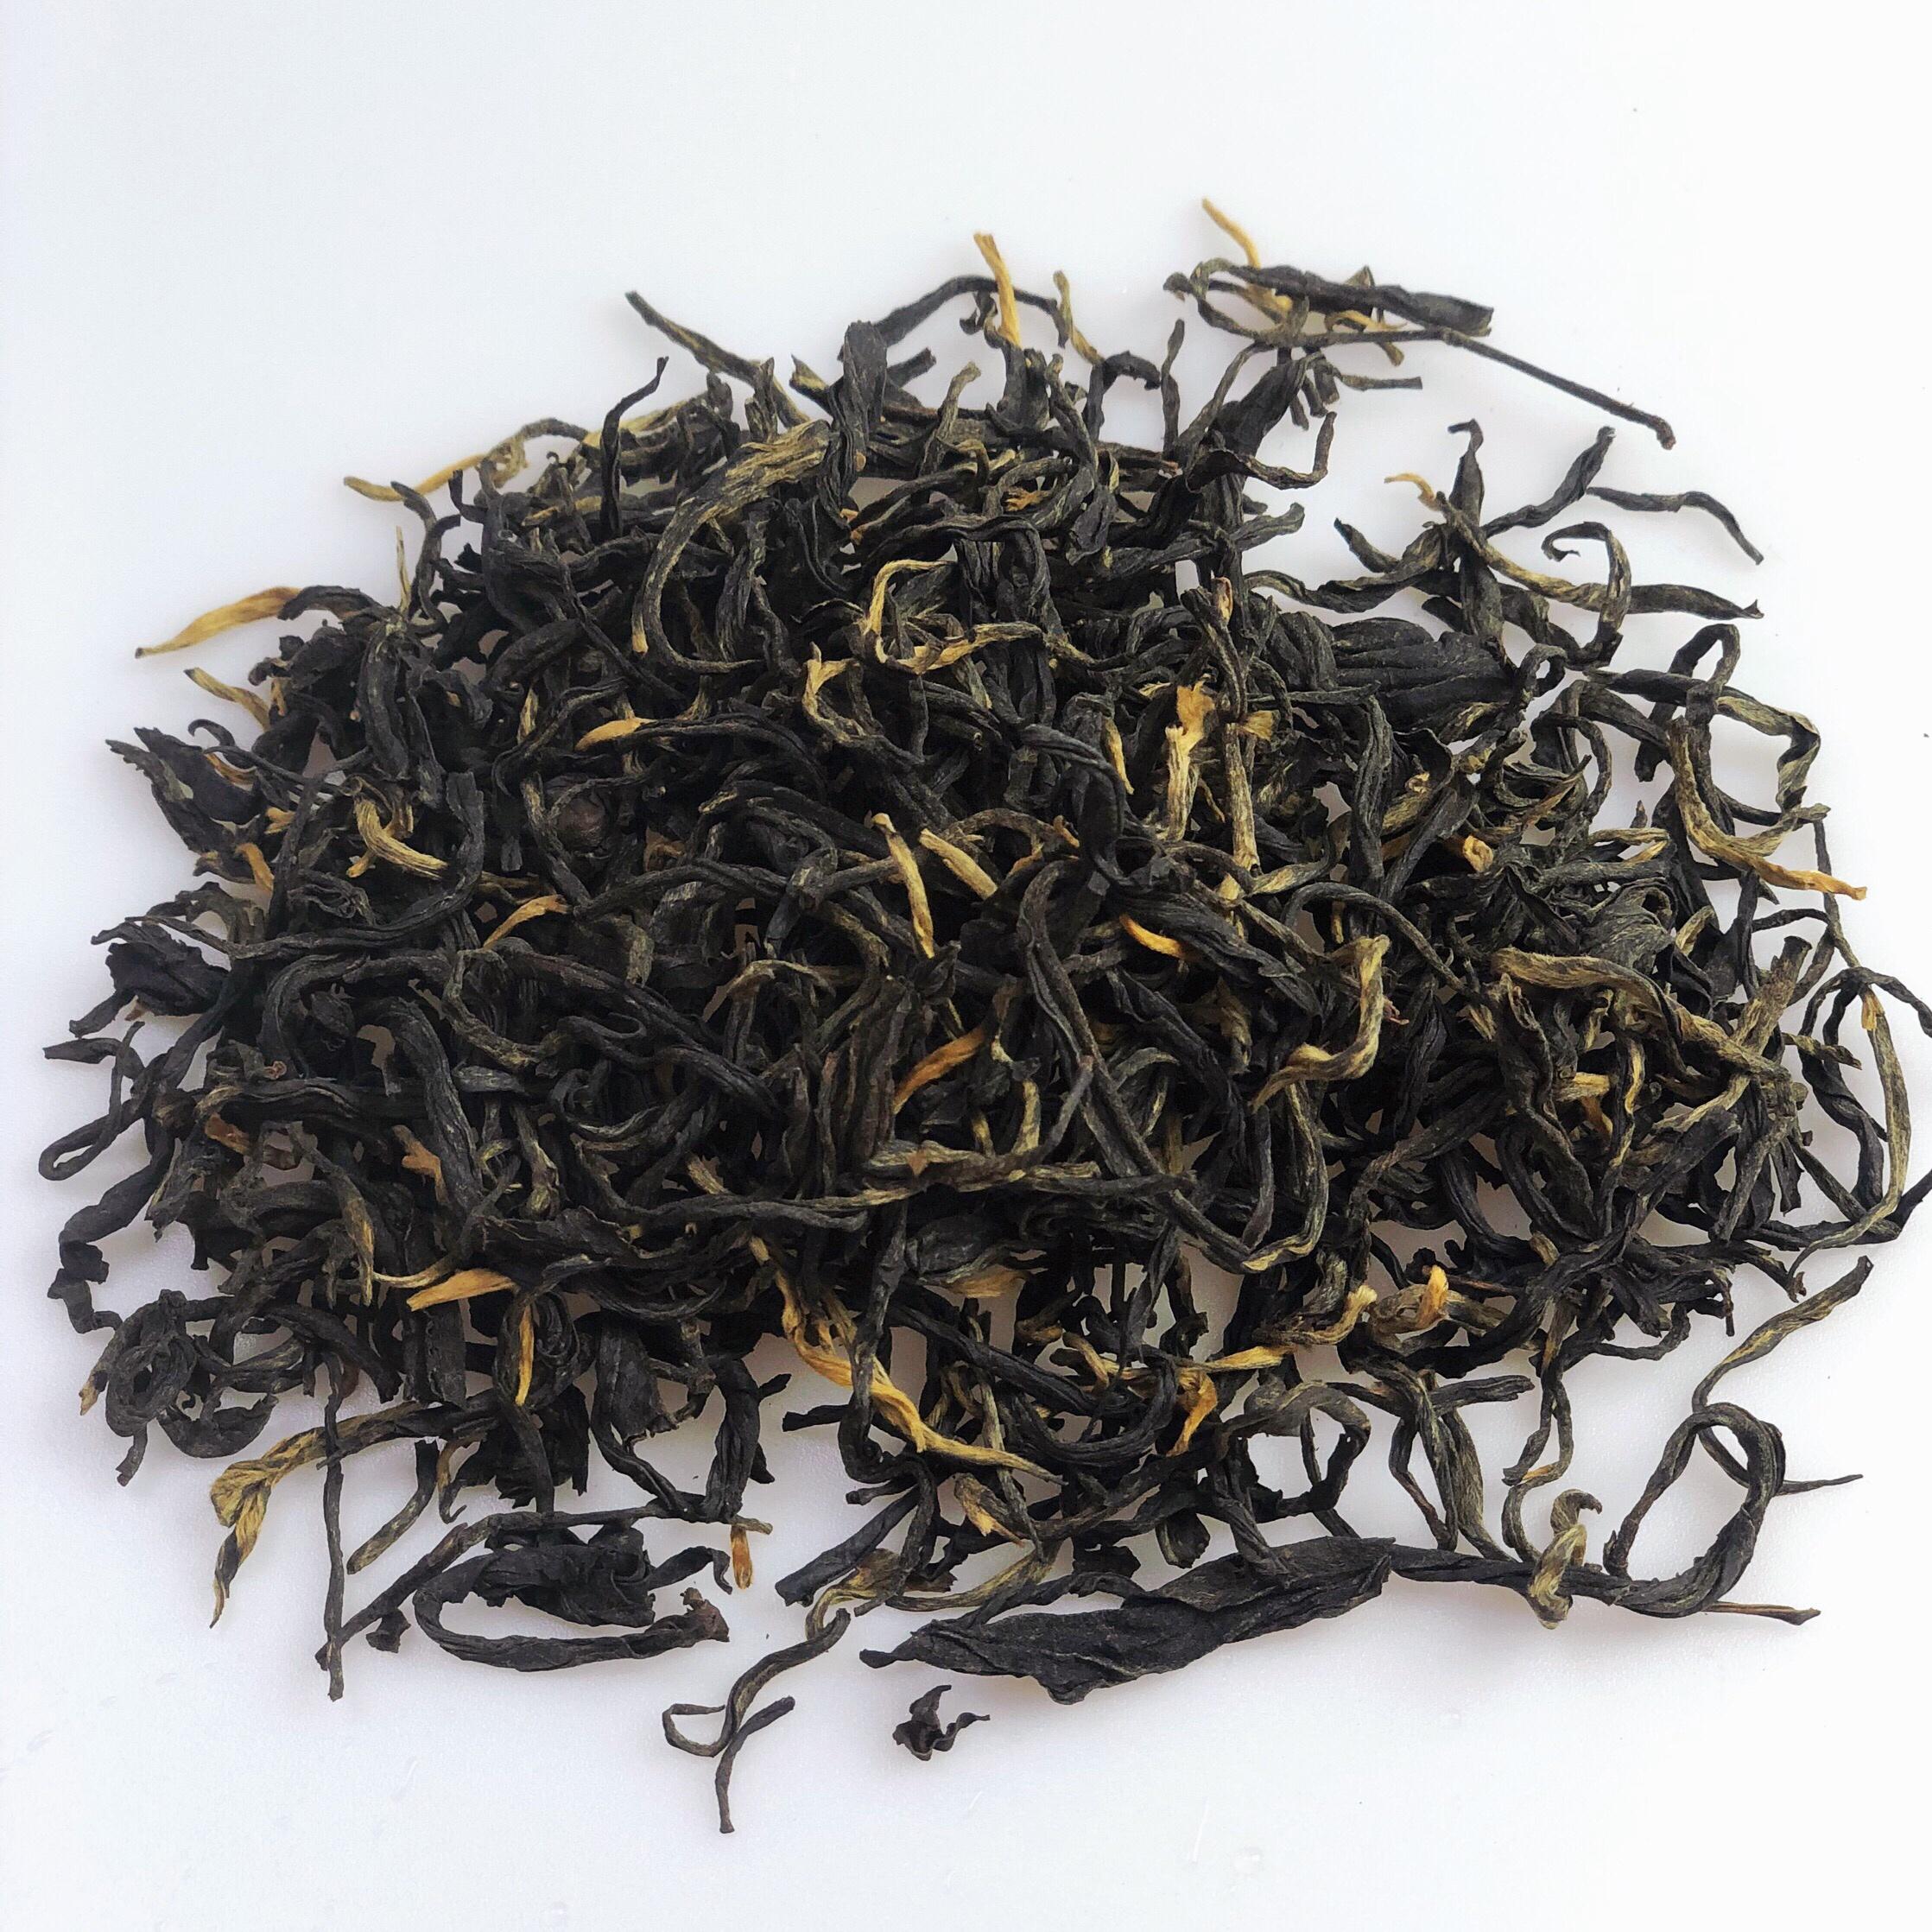 Chinese tea brand BSYTEA Green Tea OEM Chinese Maofeng tea - 4uTea   4uTea.com